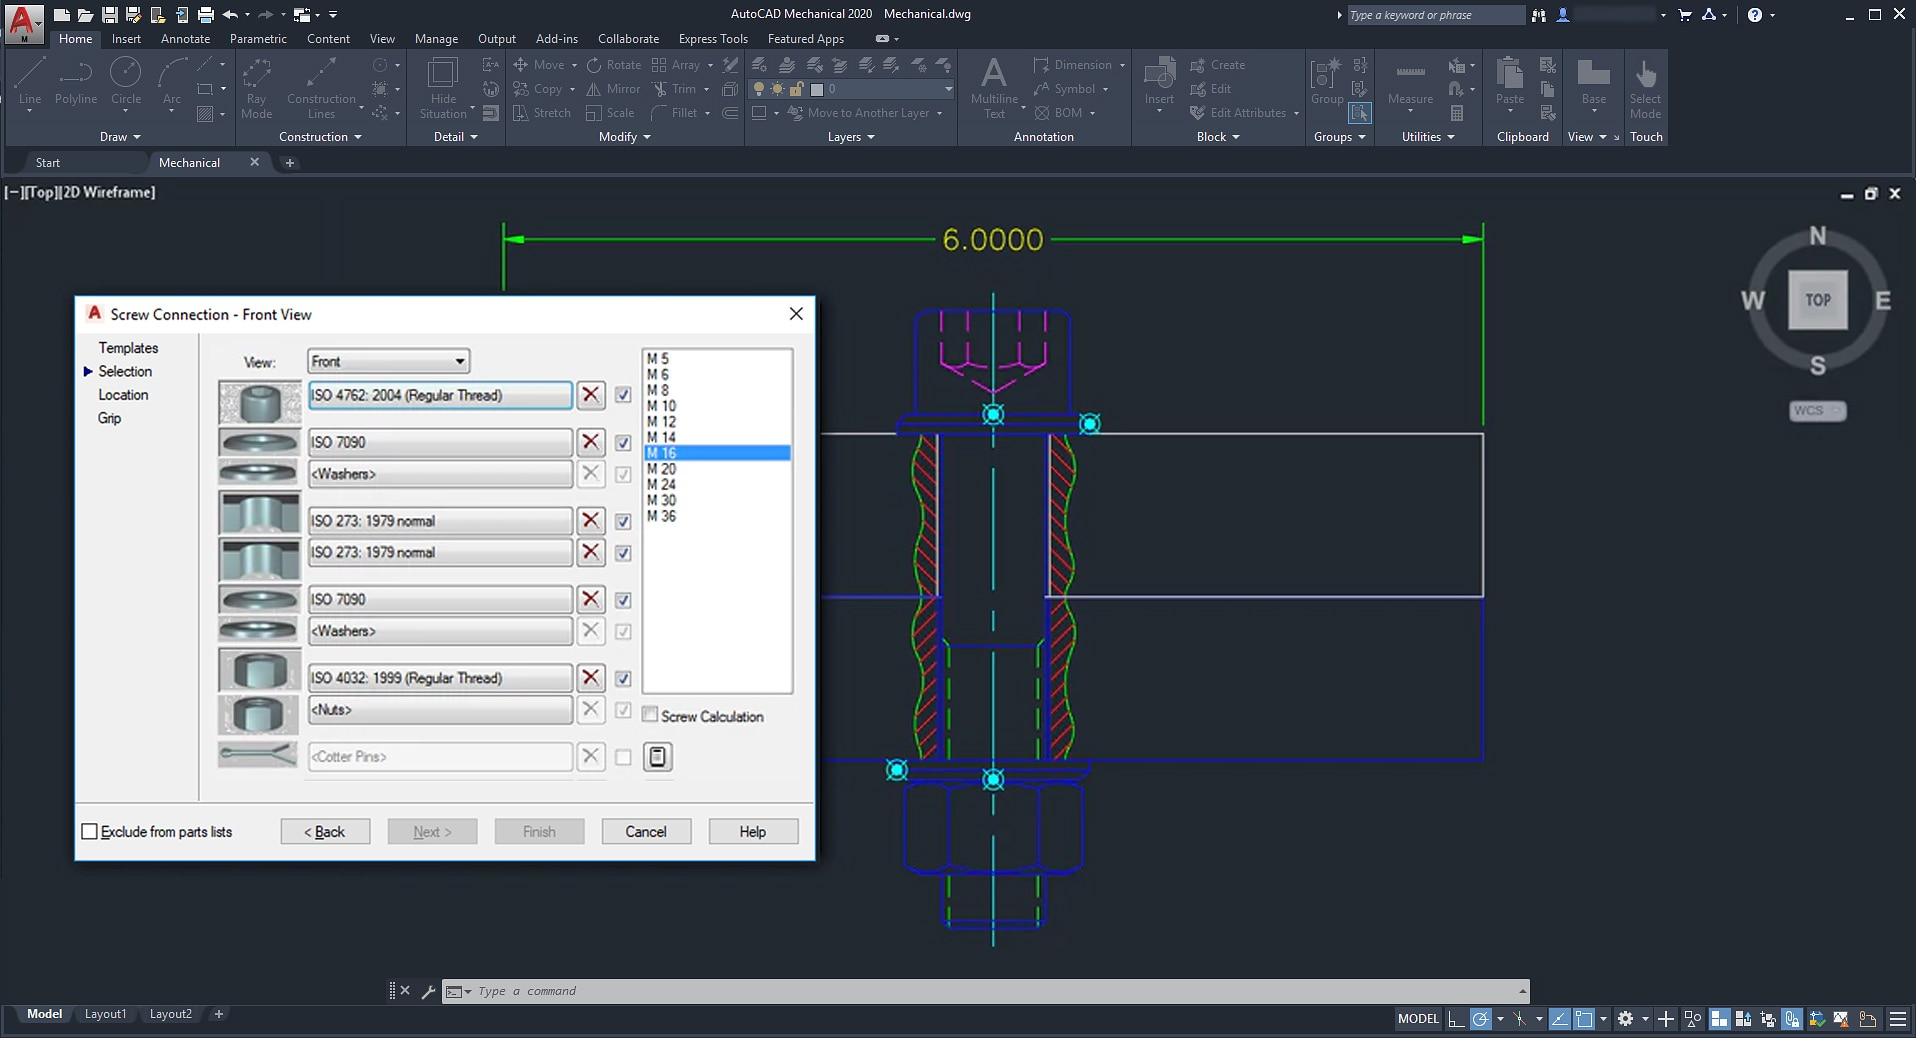 autocad mechanical toolset mechanical design software